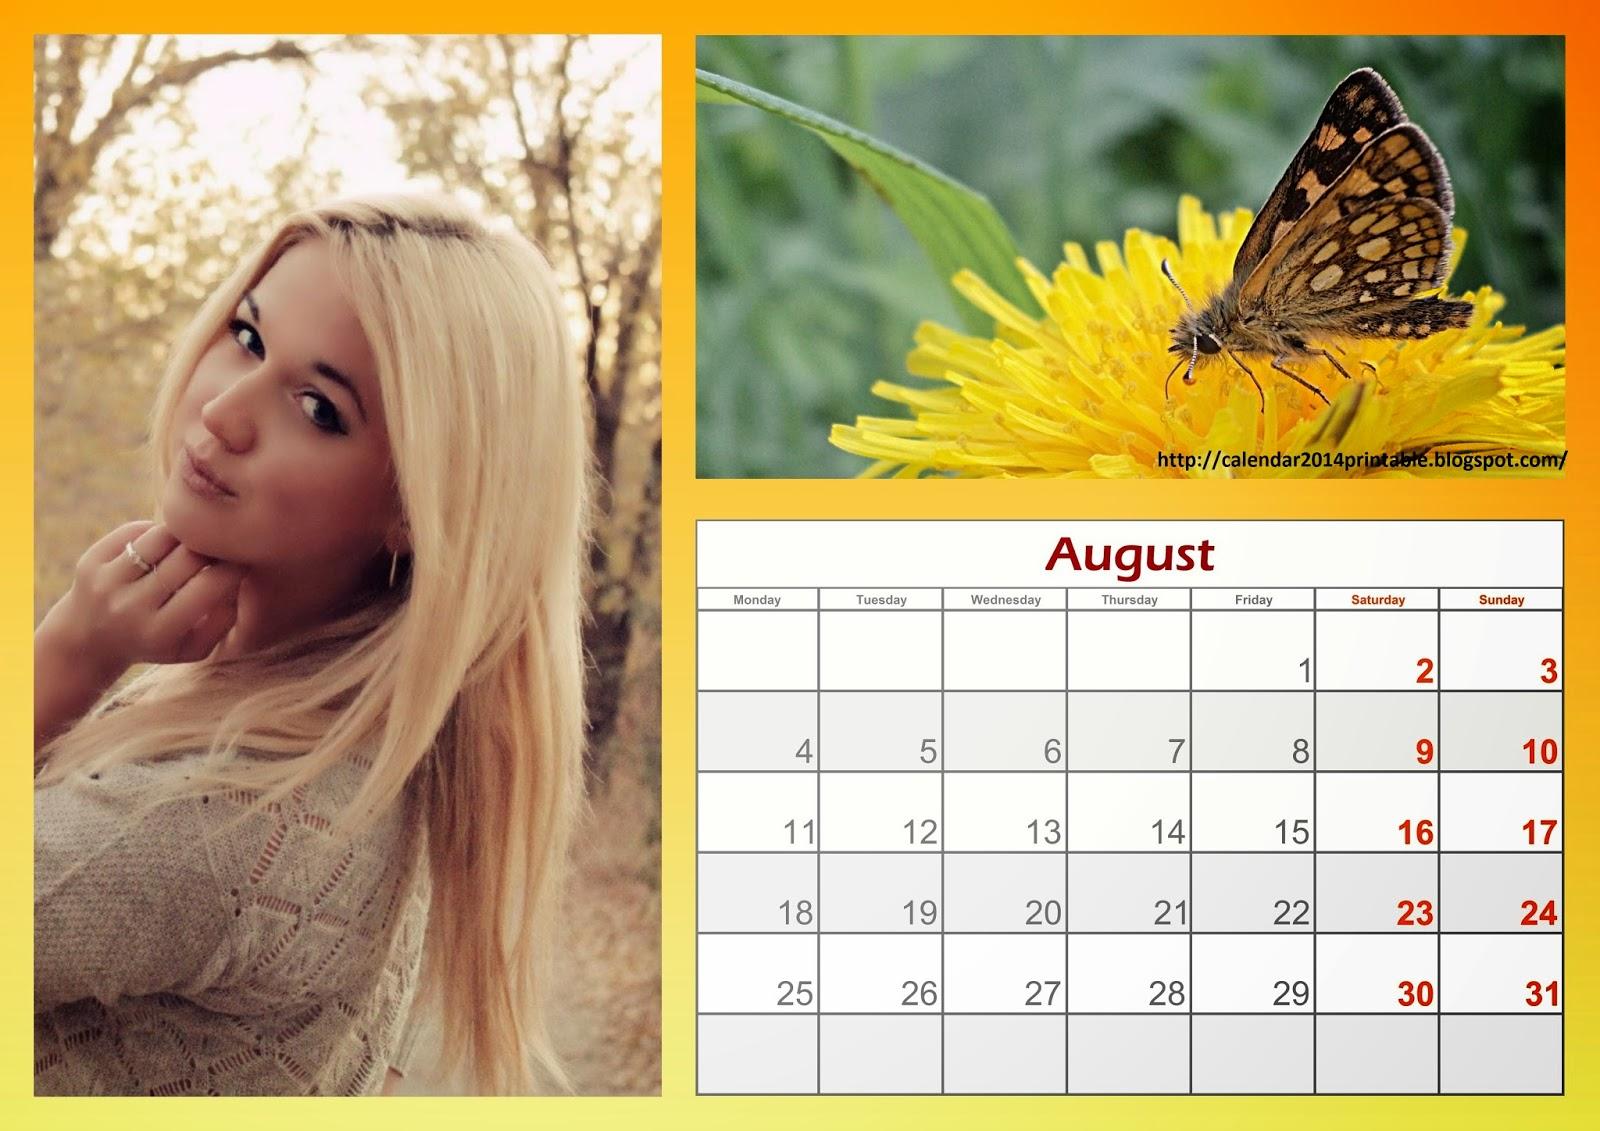 Free photo calendar maker software Digital Retouching for Fashion Beauty Portrait Photography